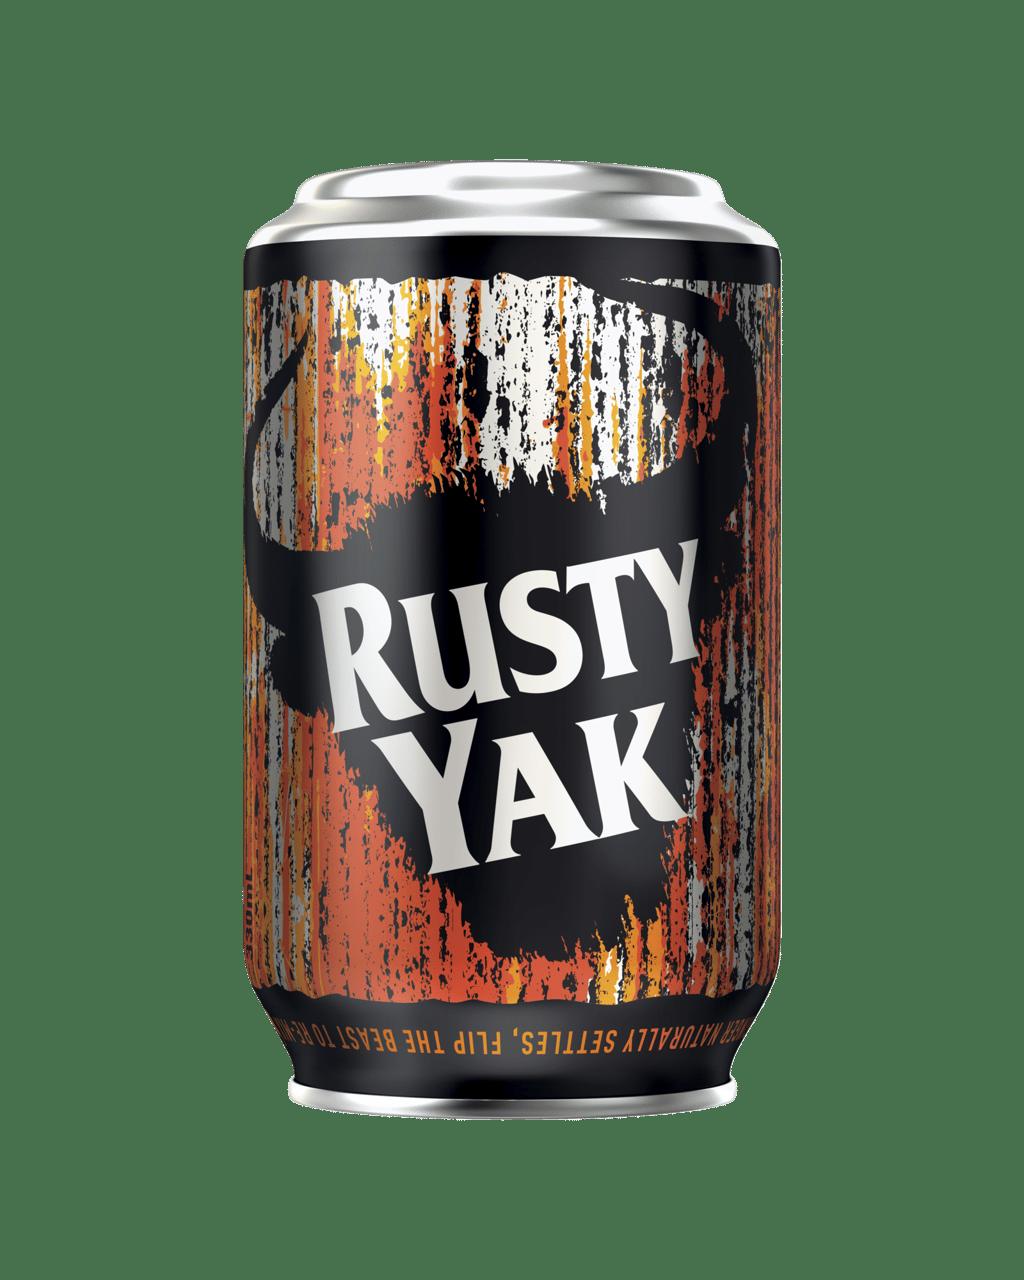 half off 527e2 d4dce Buy Matilda Bay Rusty Yak Ginger Beer Cans 330mL | Dan Murphy's